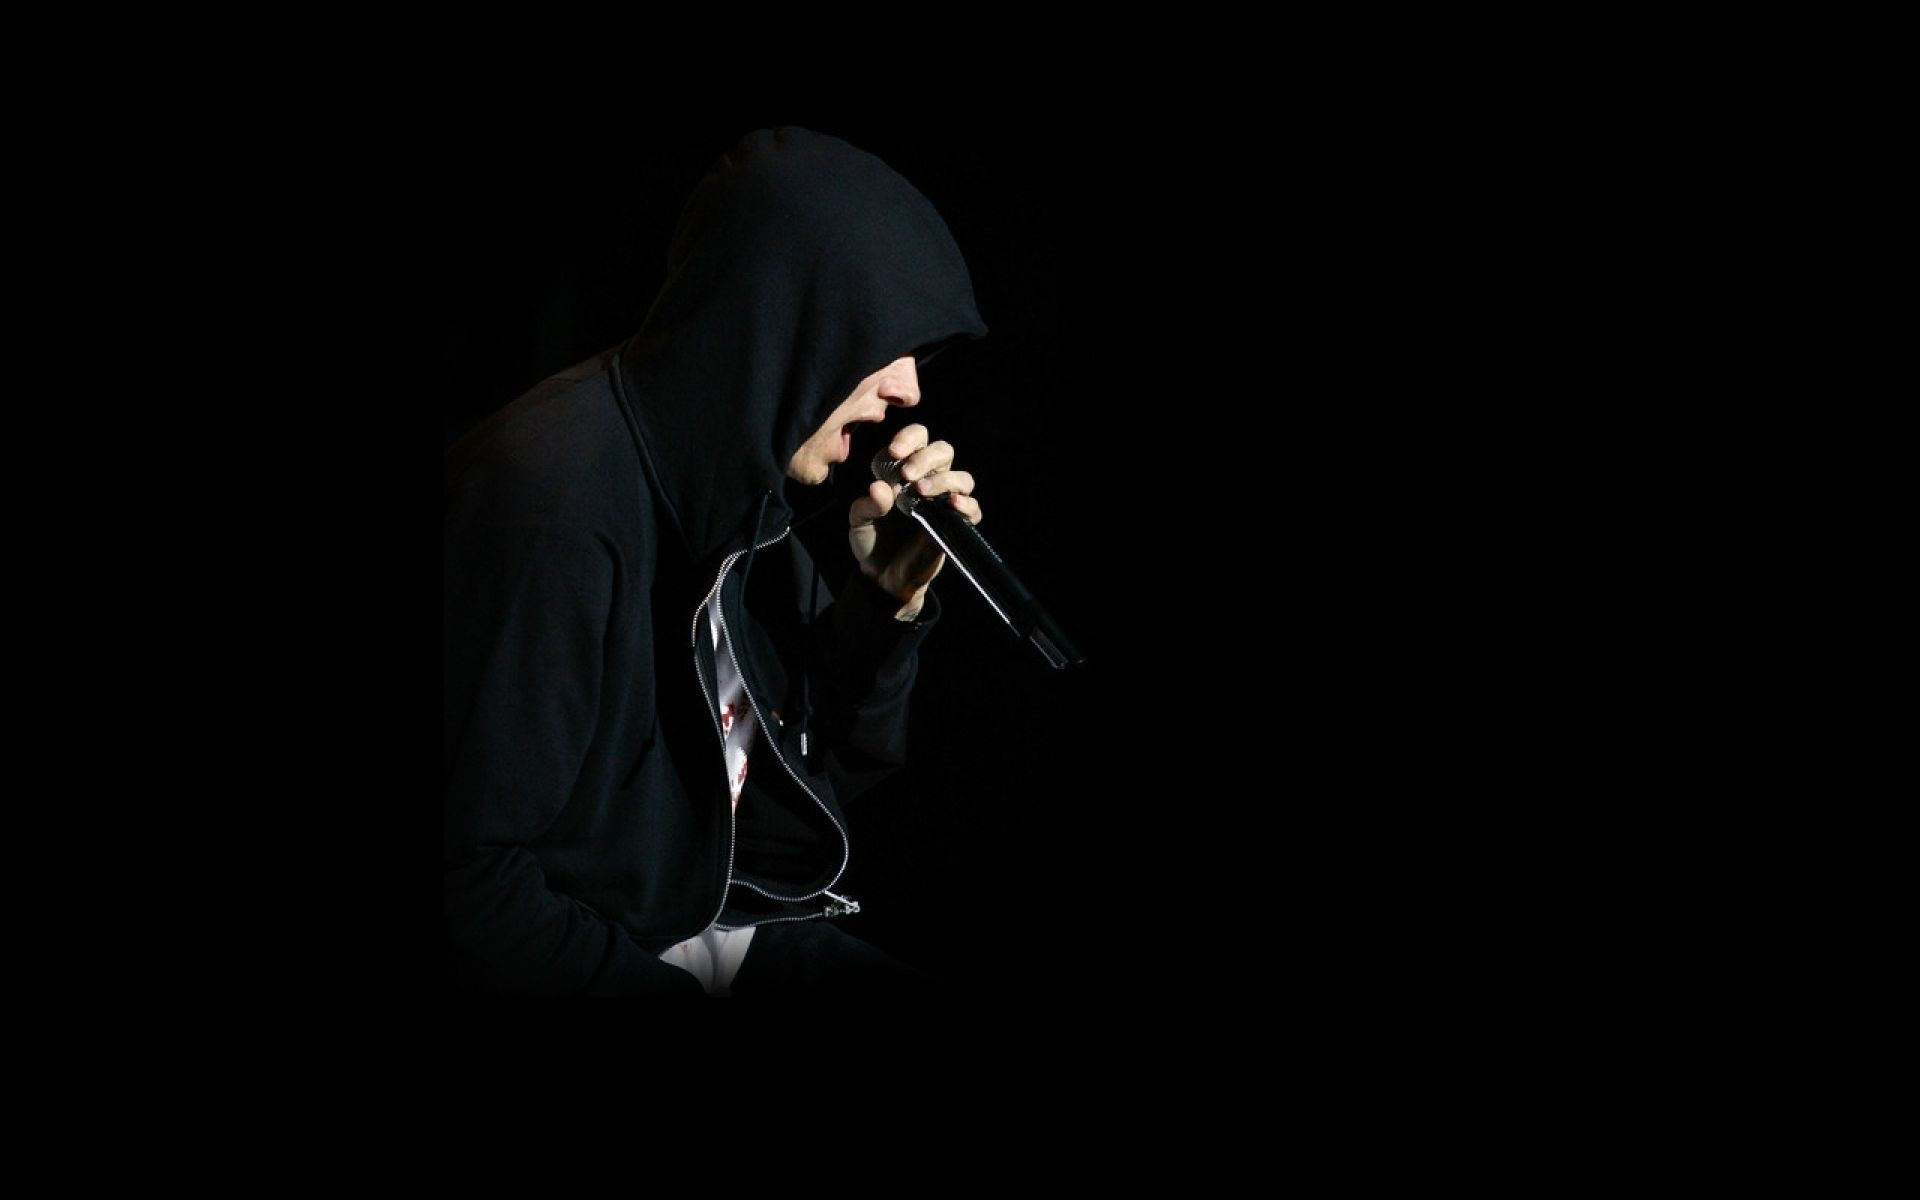 Eminem Wallpaper Hd Wallpaper Eminem Wallpapers Eminem Hd Wallpapers Eminem